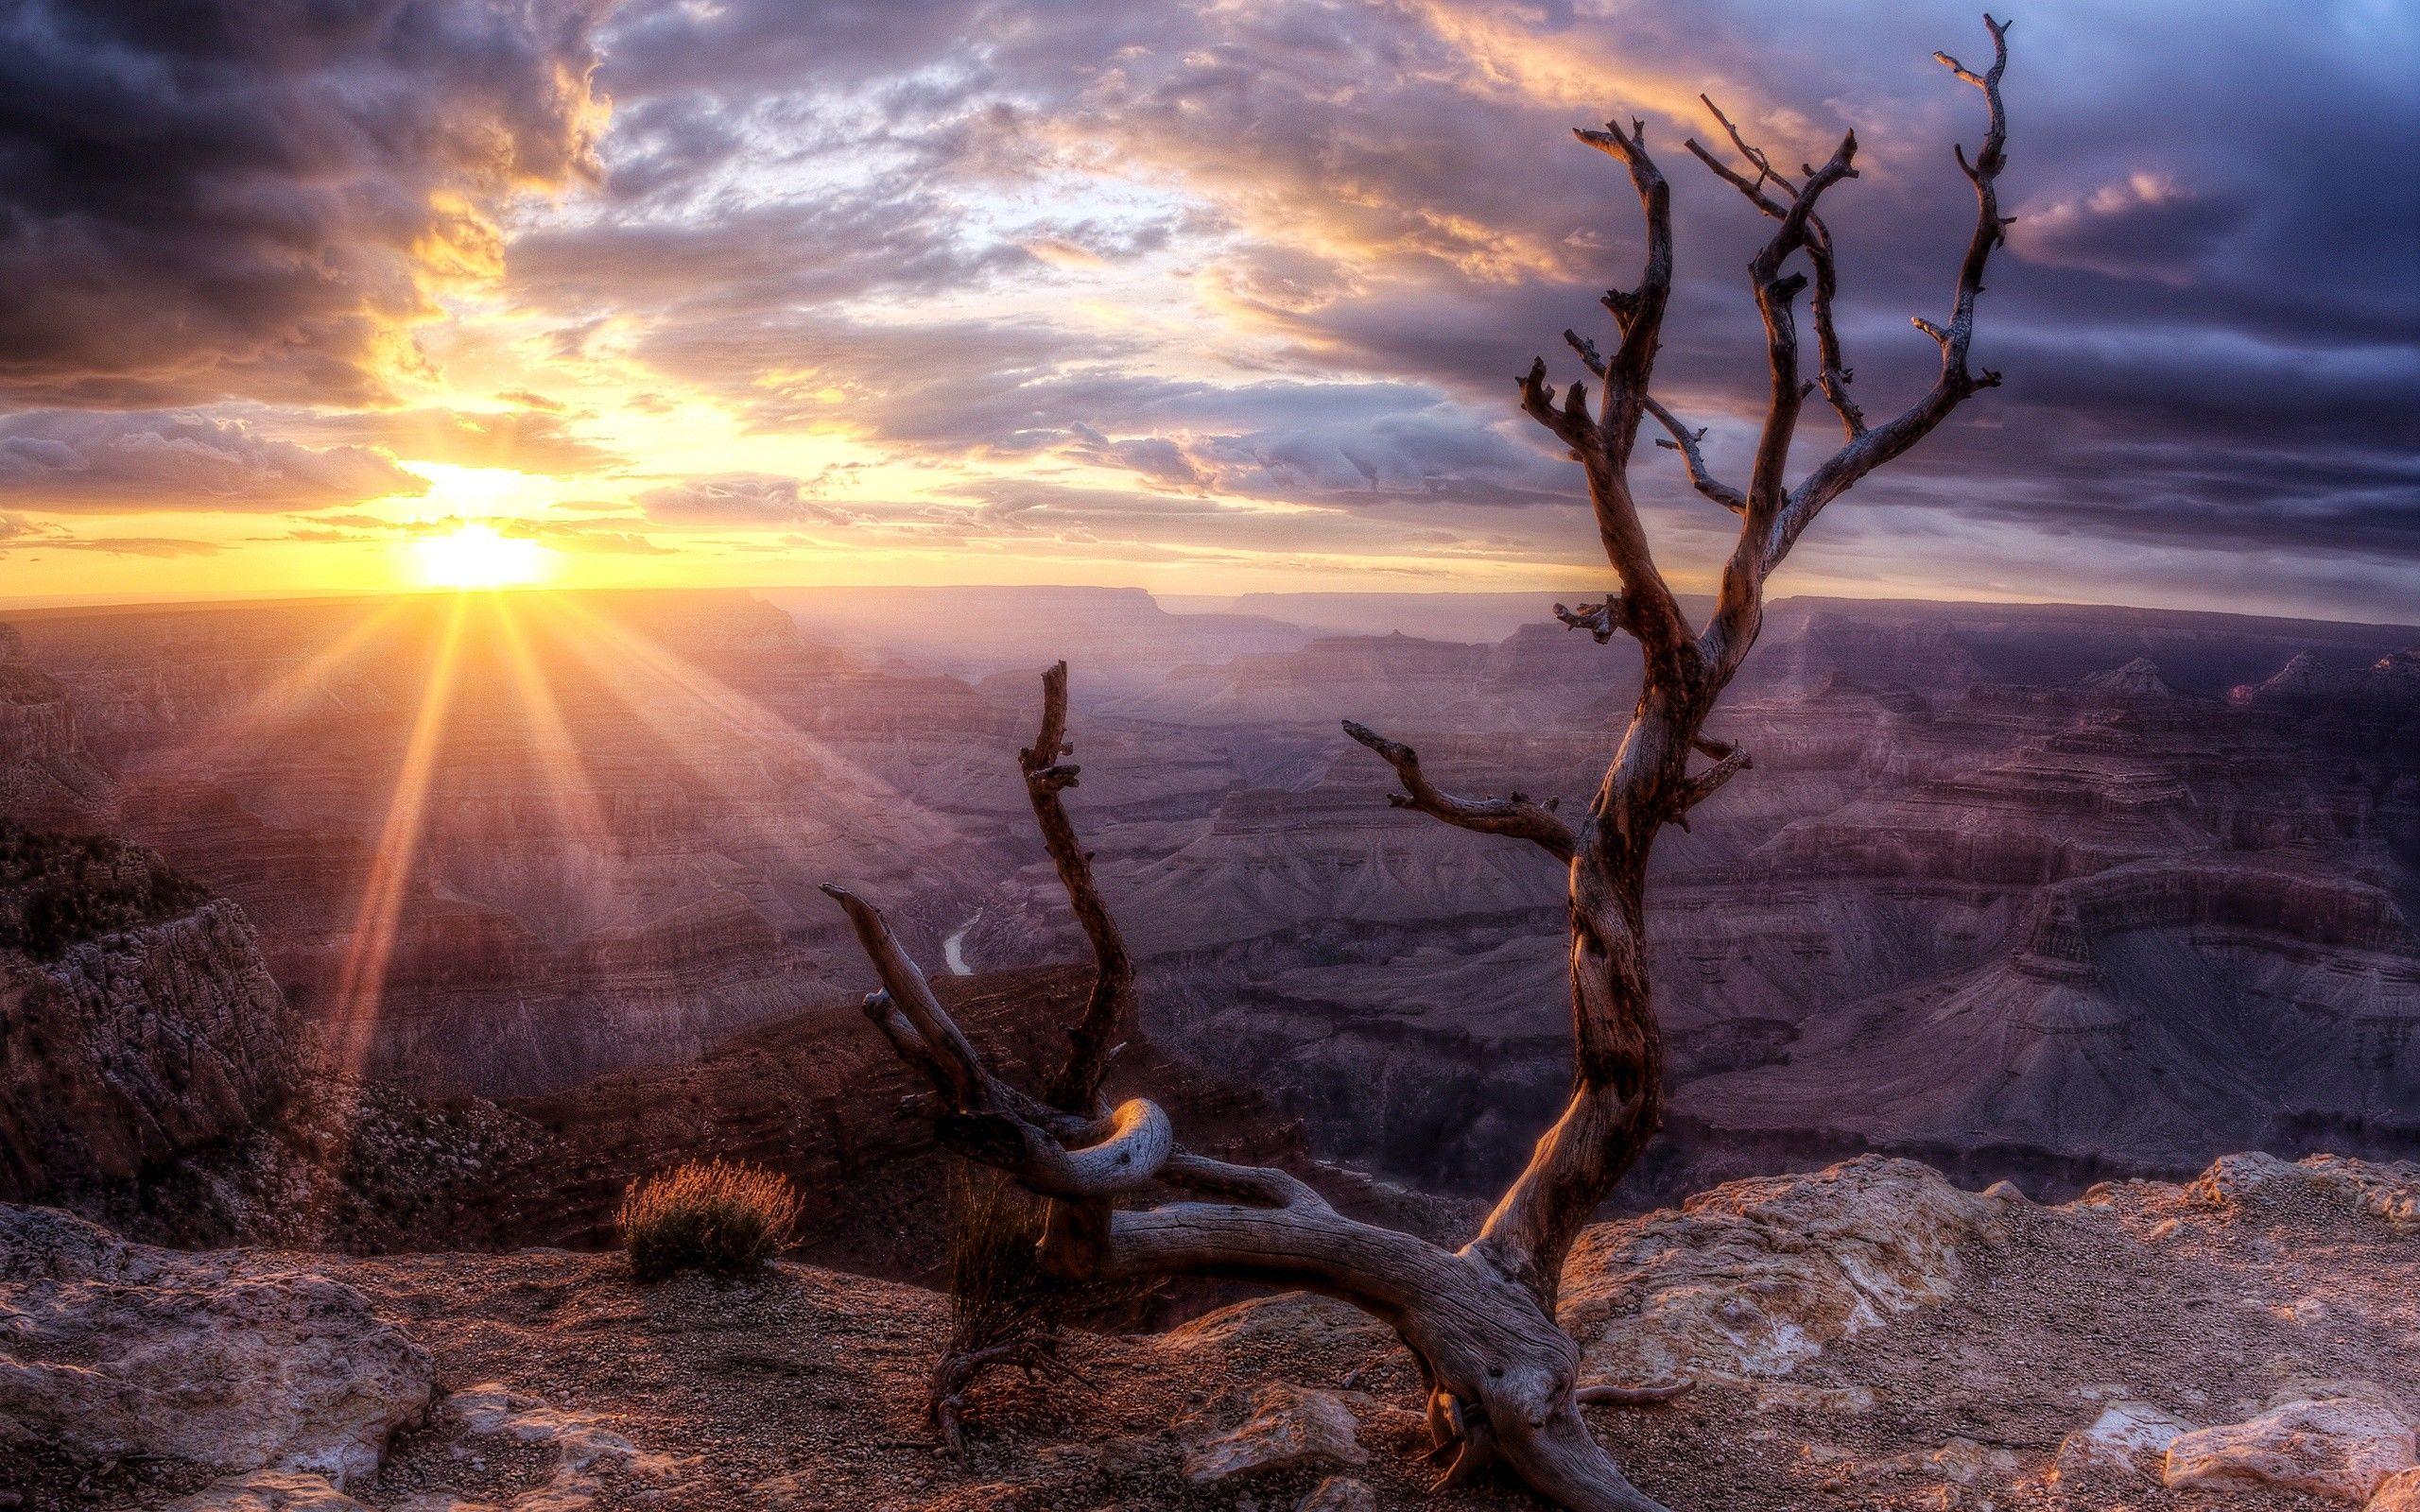 Arizona Sunrise Wallpaper High Quality Resolution #699 2560x1600 px 1.16 MB City flag hd iphone ...